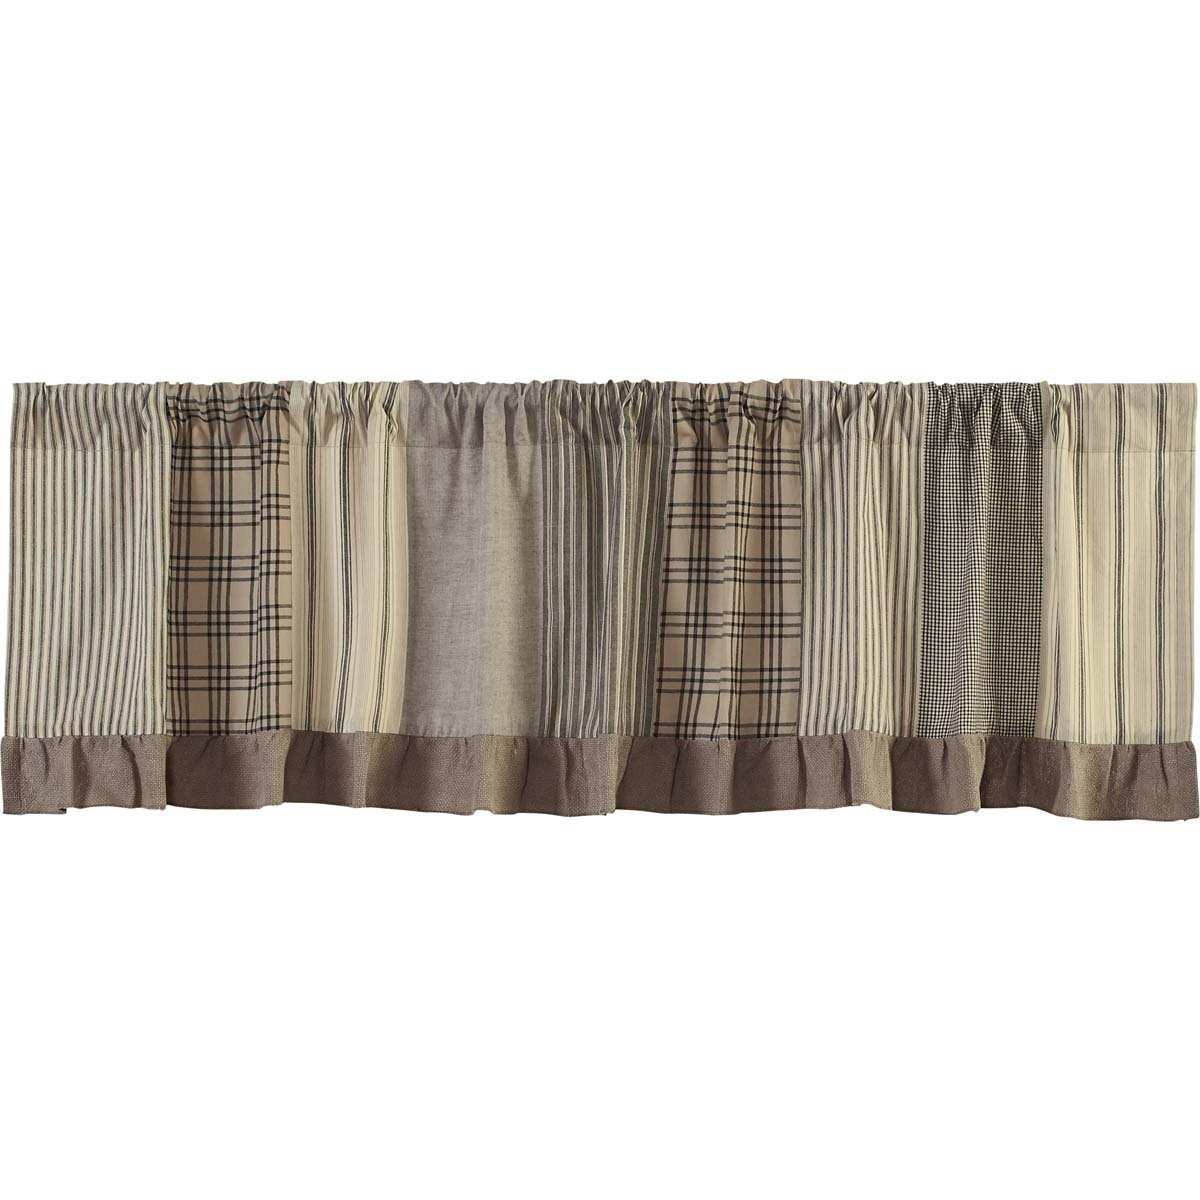 VHC Brands Farmhouse Kitchen Window Curtains - Sawyer Mill Grey Patchwork Valance 19x72 Charcoal